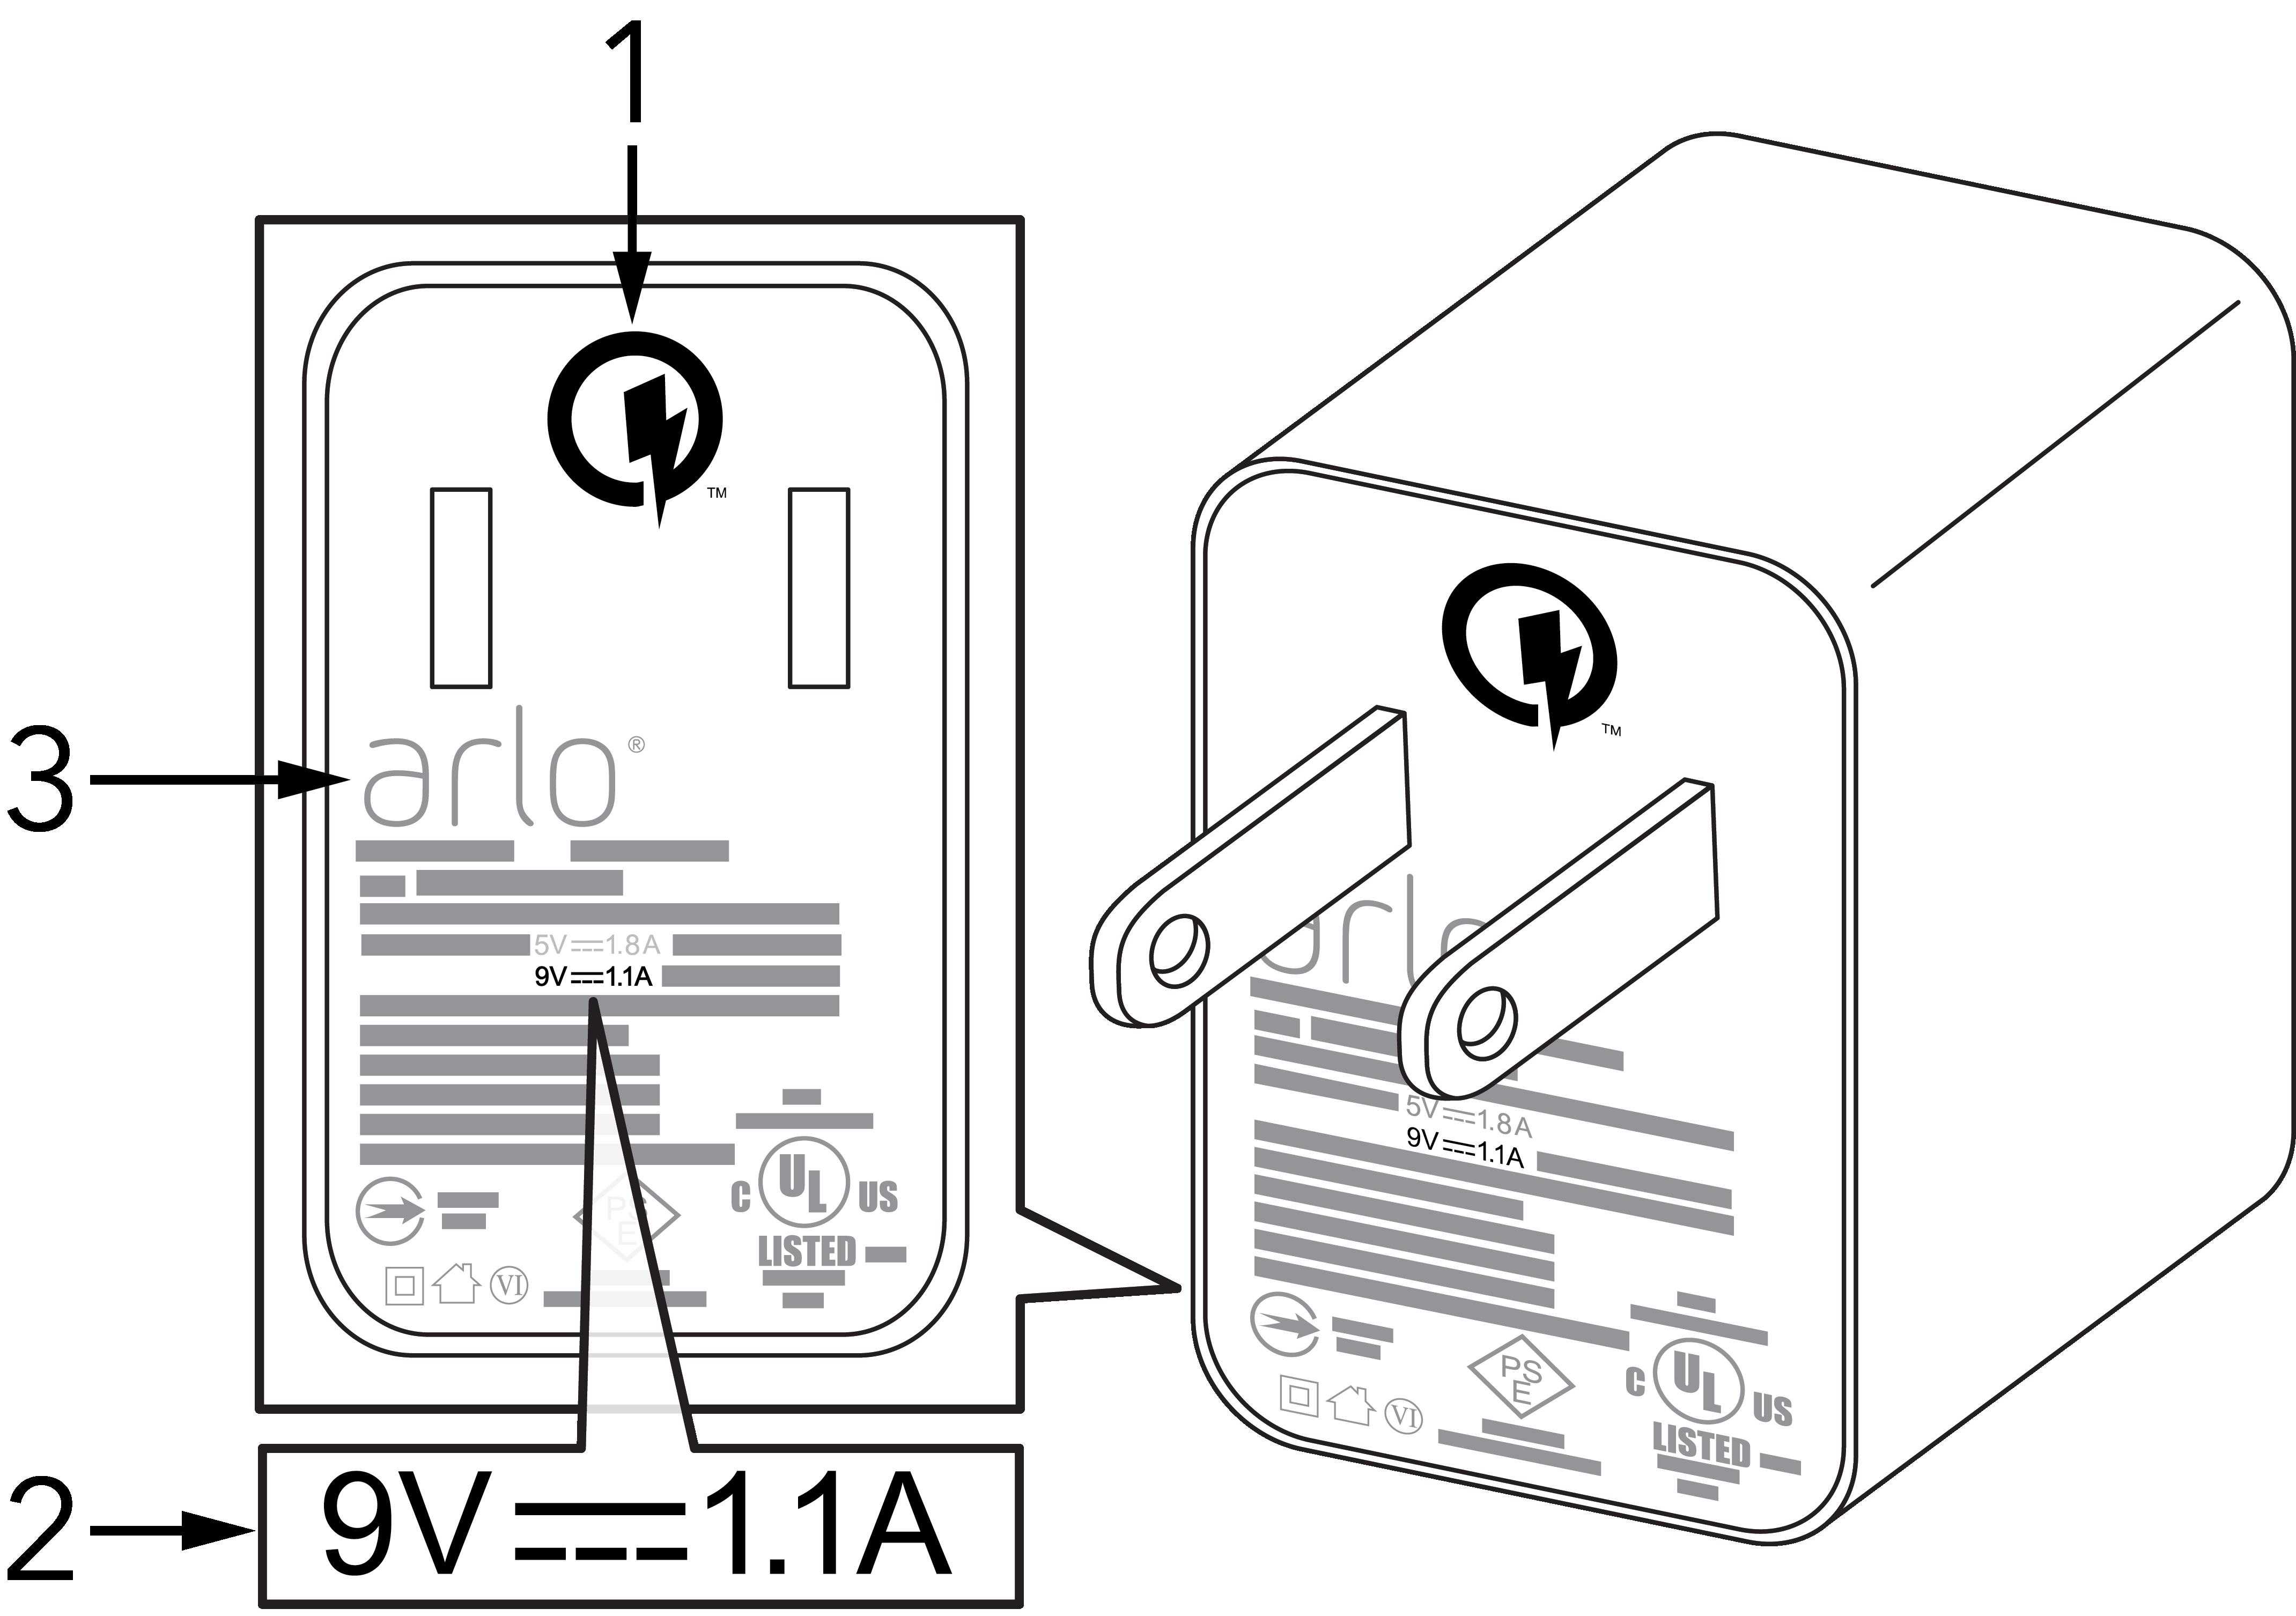 My Arlo Pro or Arlo Pro 2 camera battery isn't charging